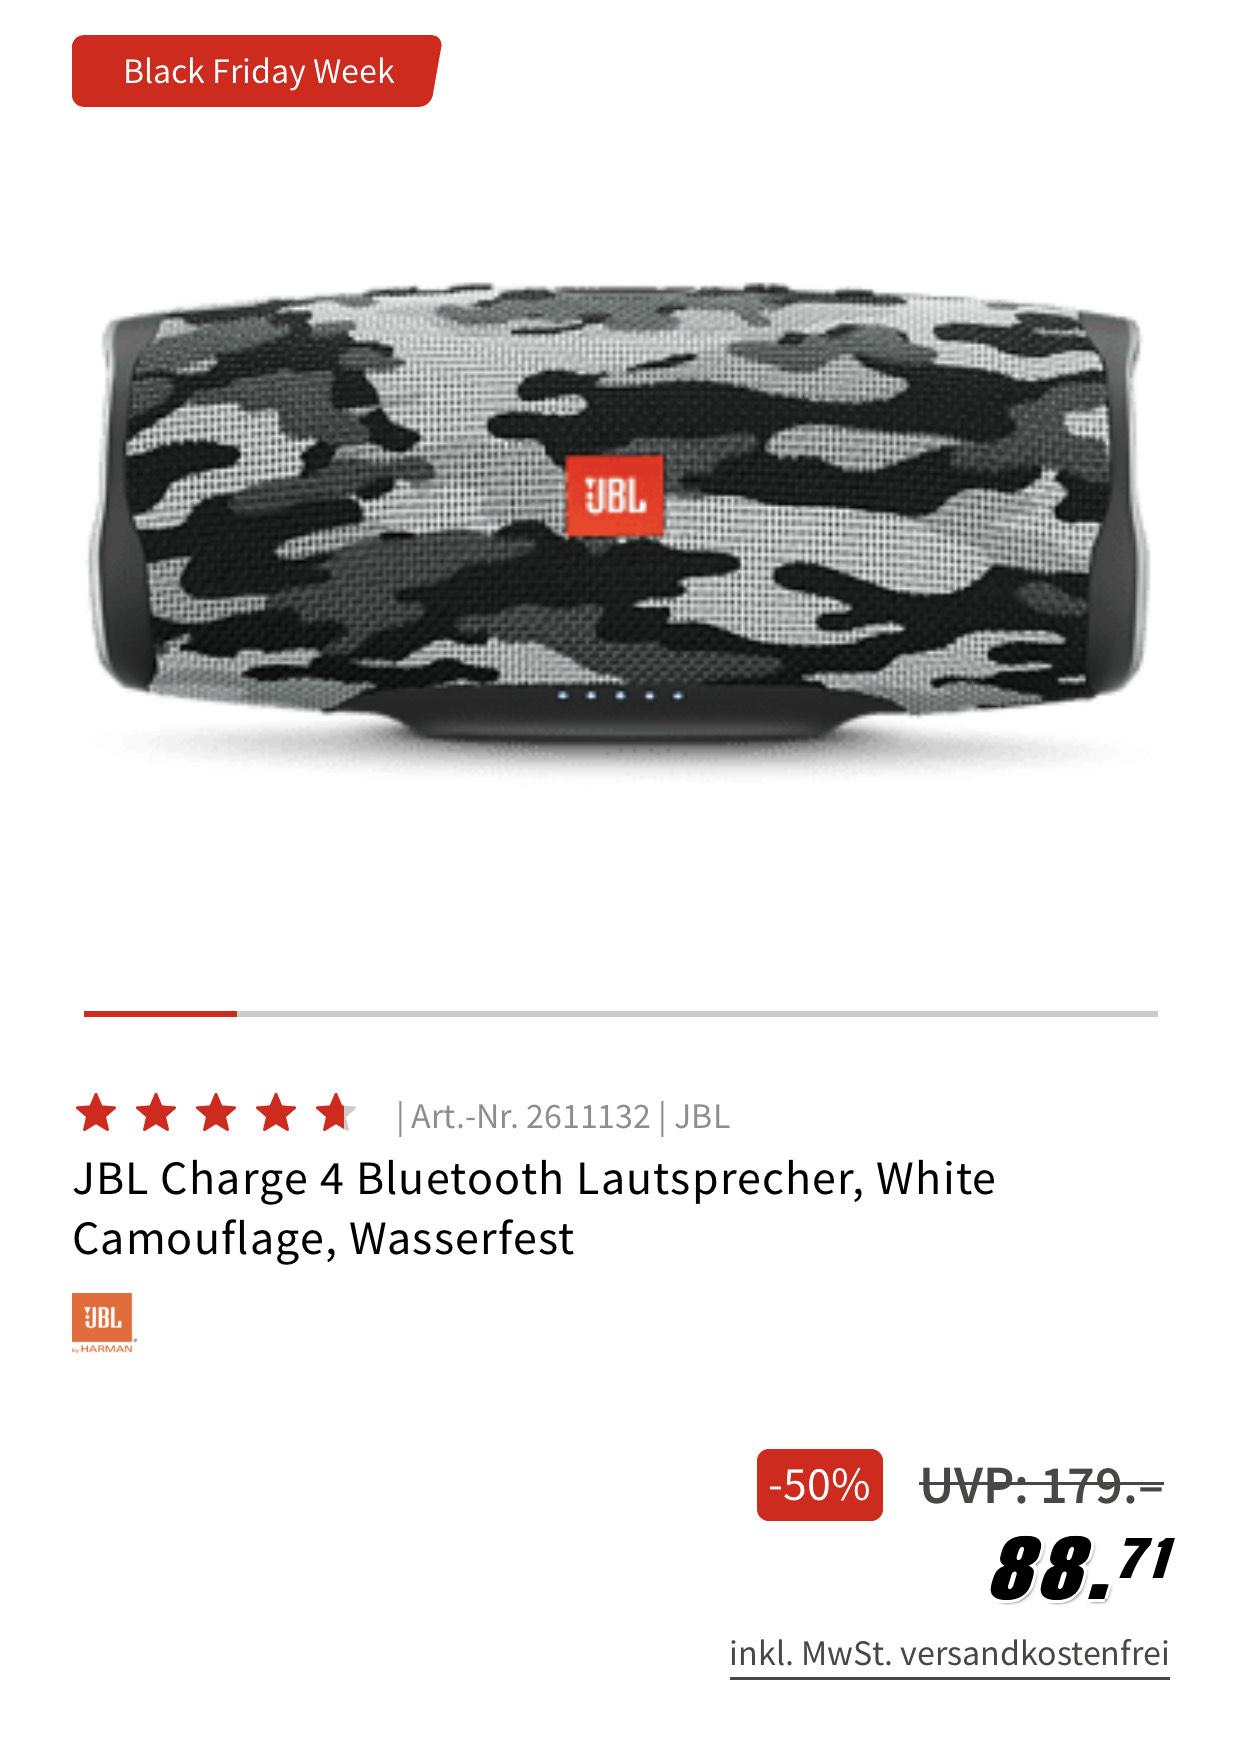 JBL Charge 4 Lautsprecher